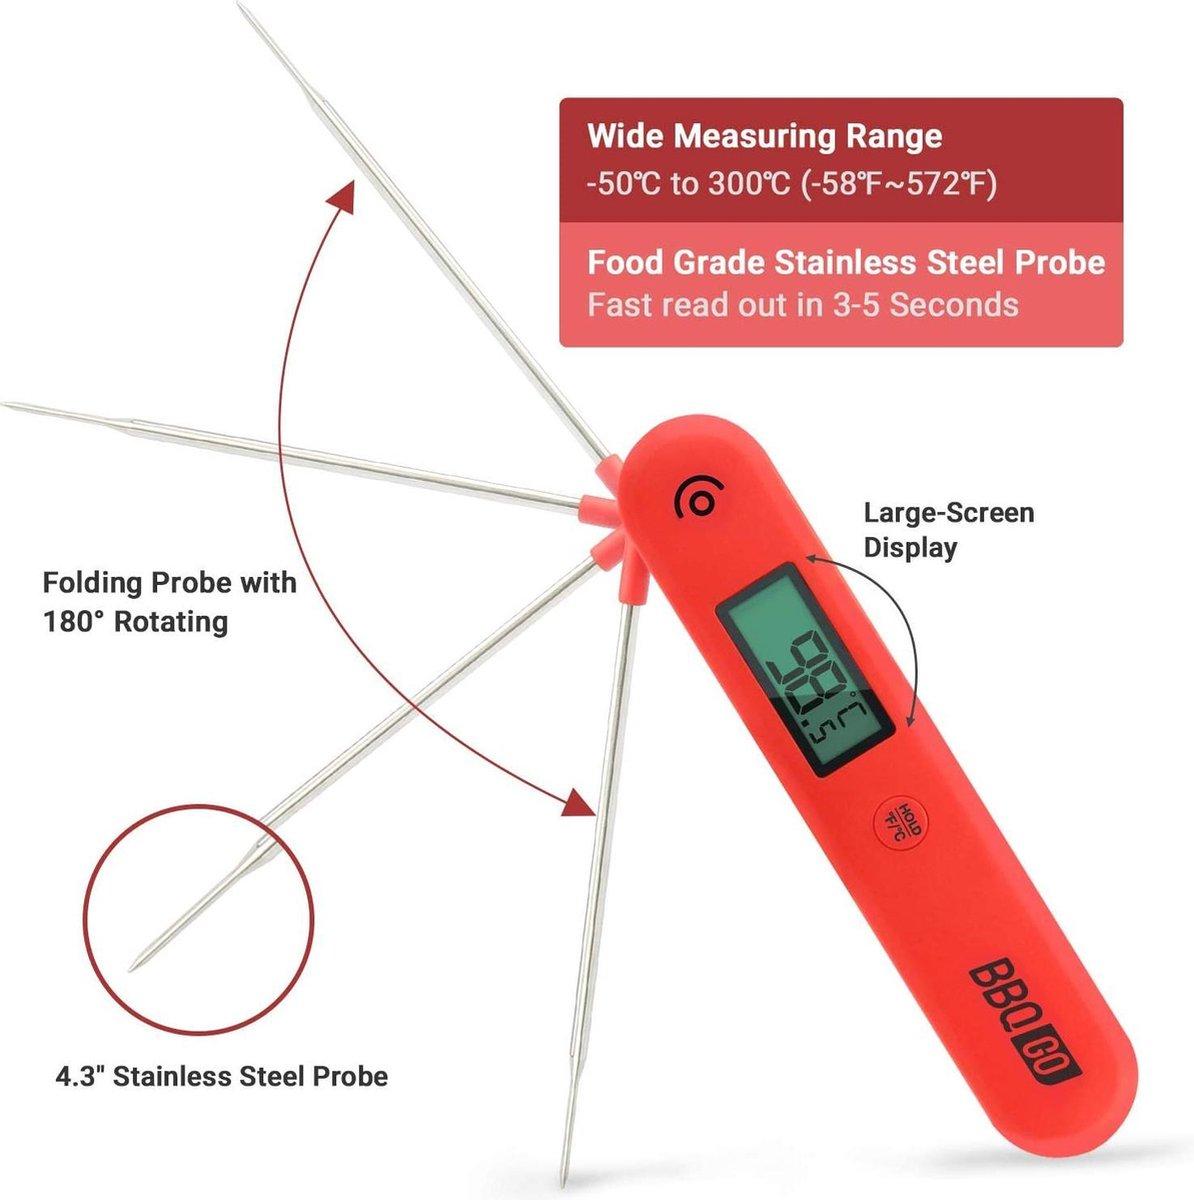 Inkbird BG-HH1C Digitale Vleesthermometer, Keukenthermometer met Opvouwbare Probe, Draadloze BBQ Thermometer voor Koken, Snoep, Bakken, Frituren